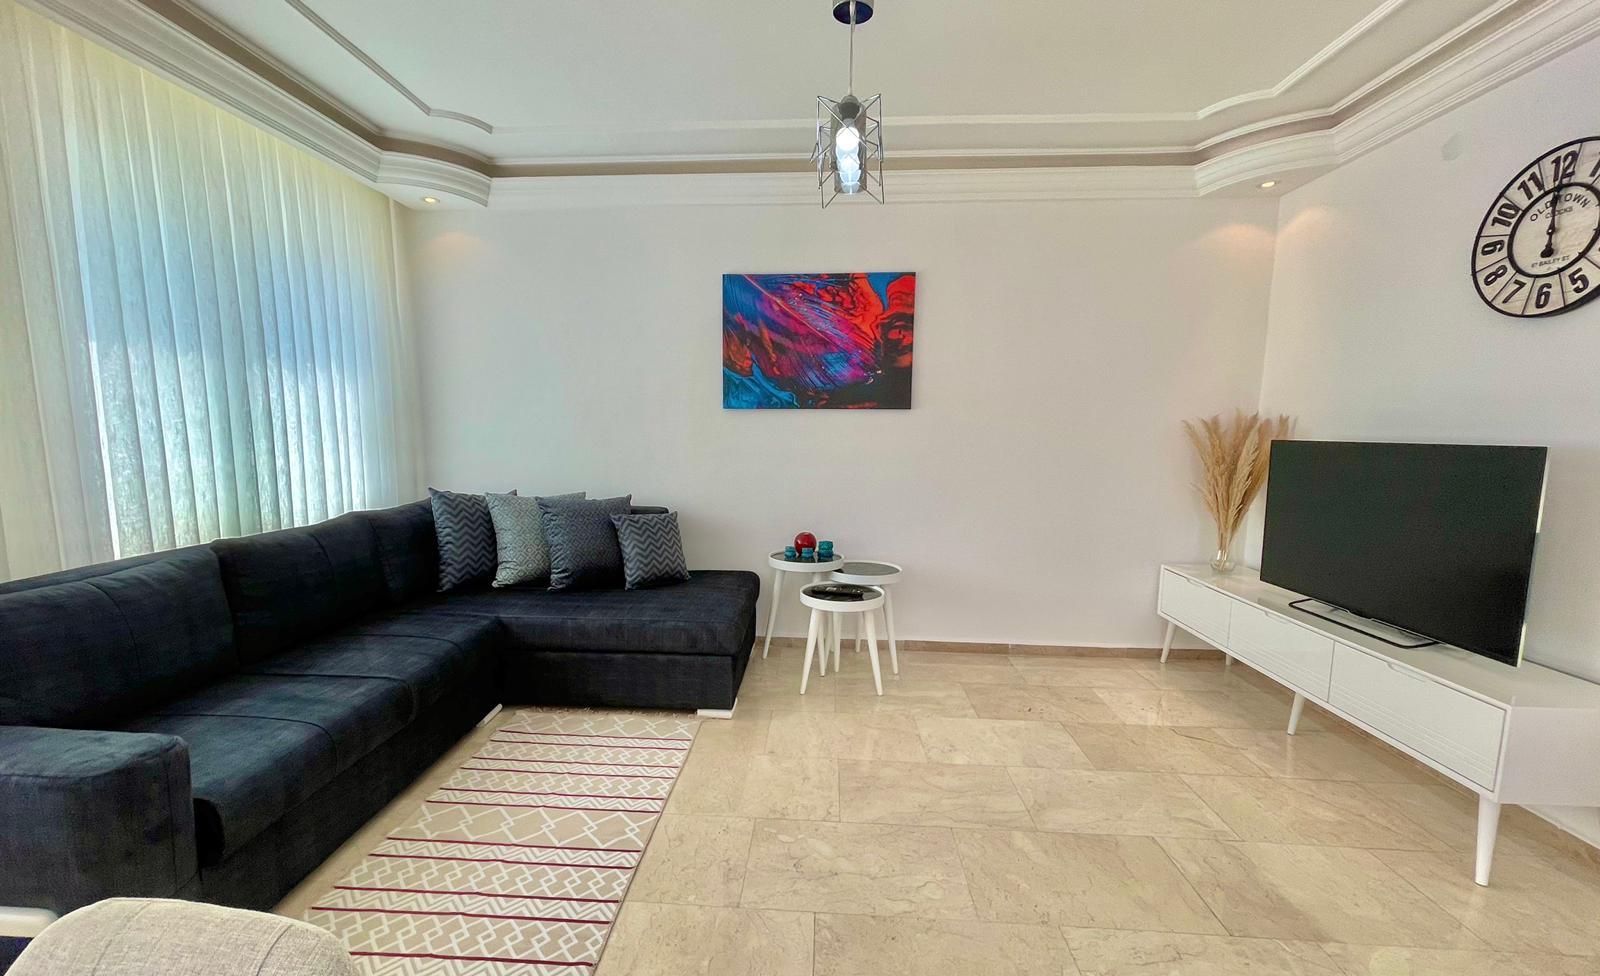 Трёхкомнатная квартира в «двух шагах» от Средиземного моря - Фото 9